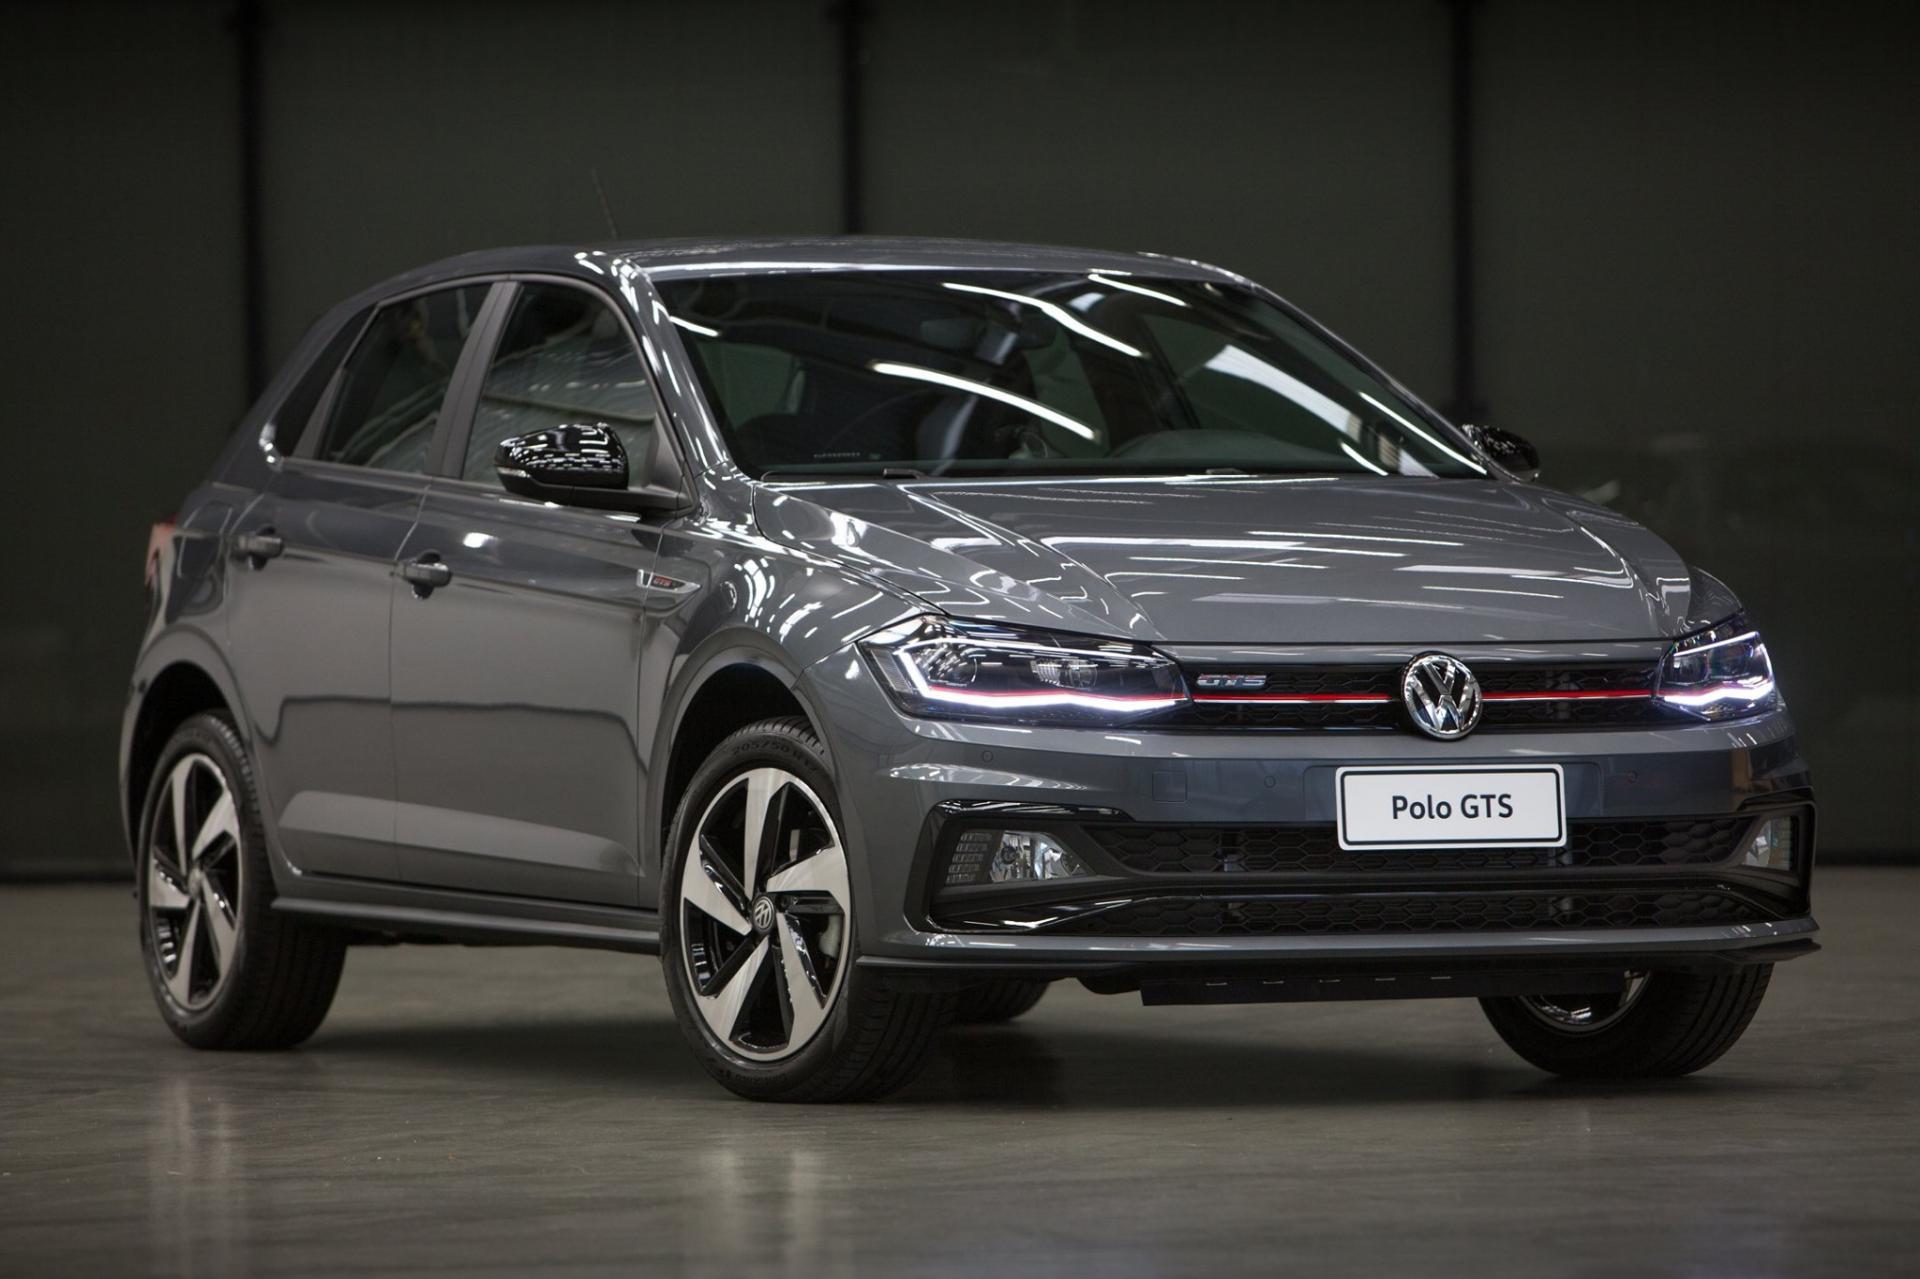 VW-Polo-GTS-Brazil-spec-5-1